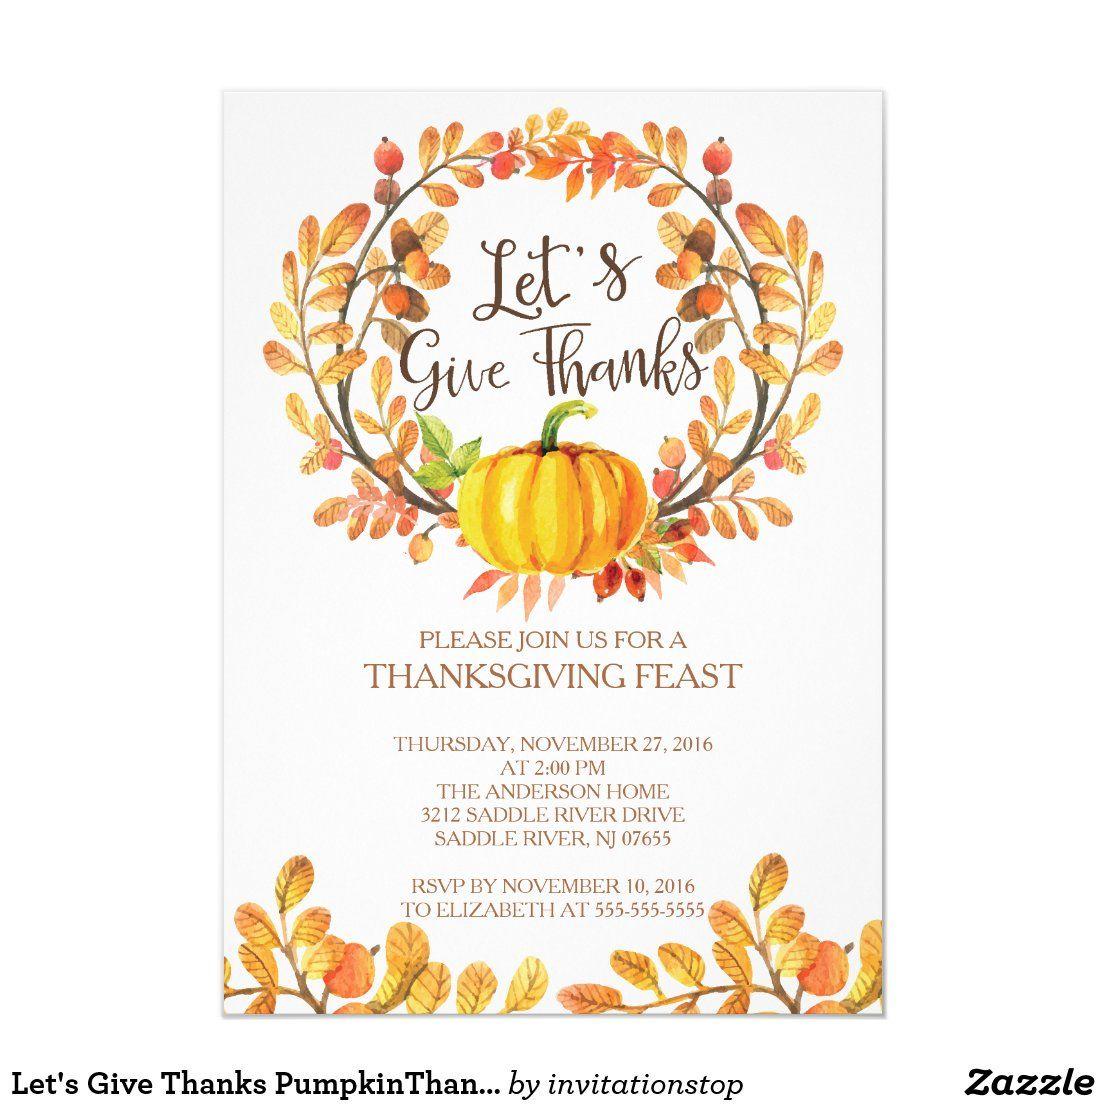 Let S Give Thanks Pumpkinthanksgiving Dinner Invitation Zazzle Com In 2020 Pumpkin Baby Shower Invitation Dinner Invitations Give Thanks